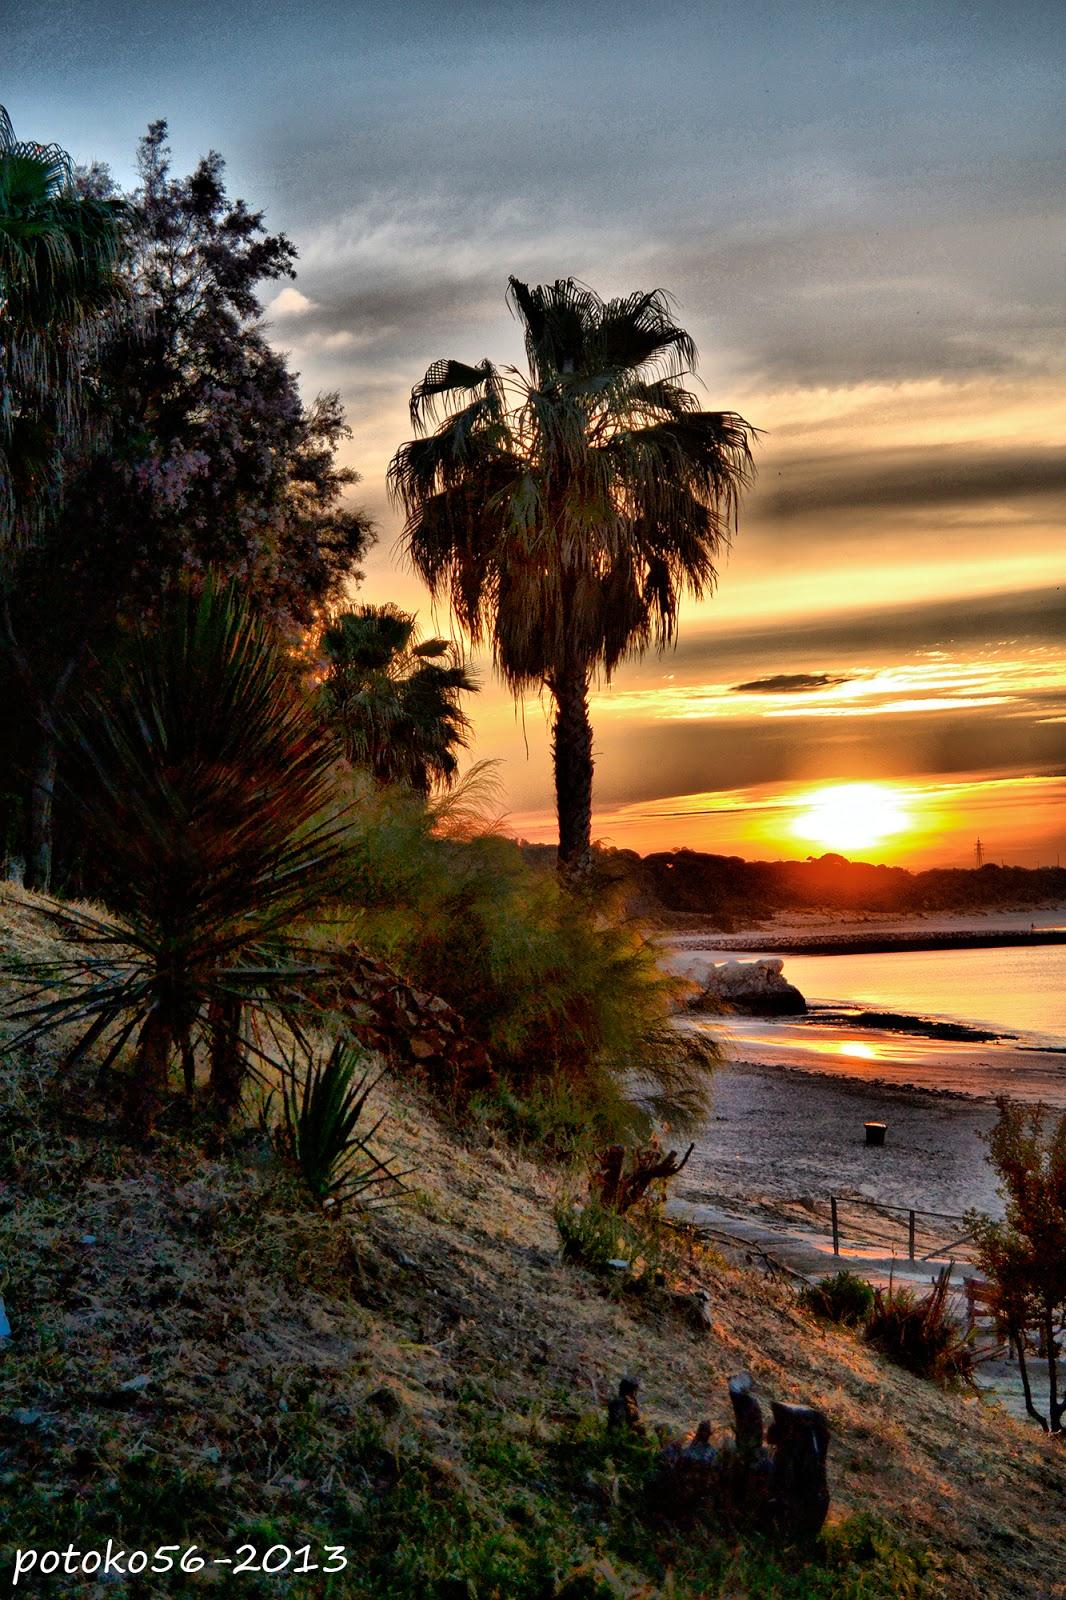 la naturaleza en el amanecer Rota